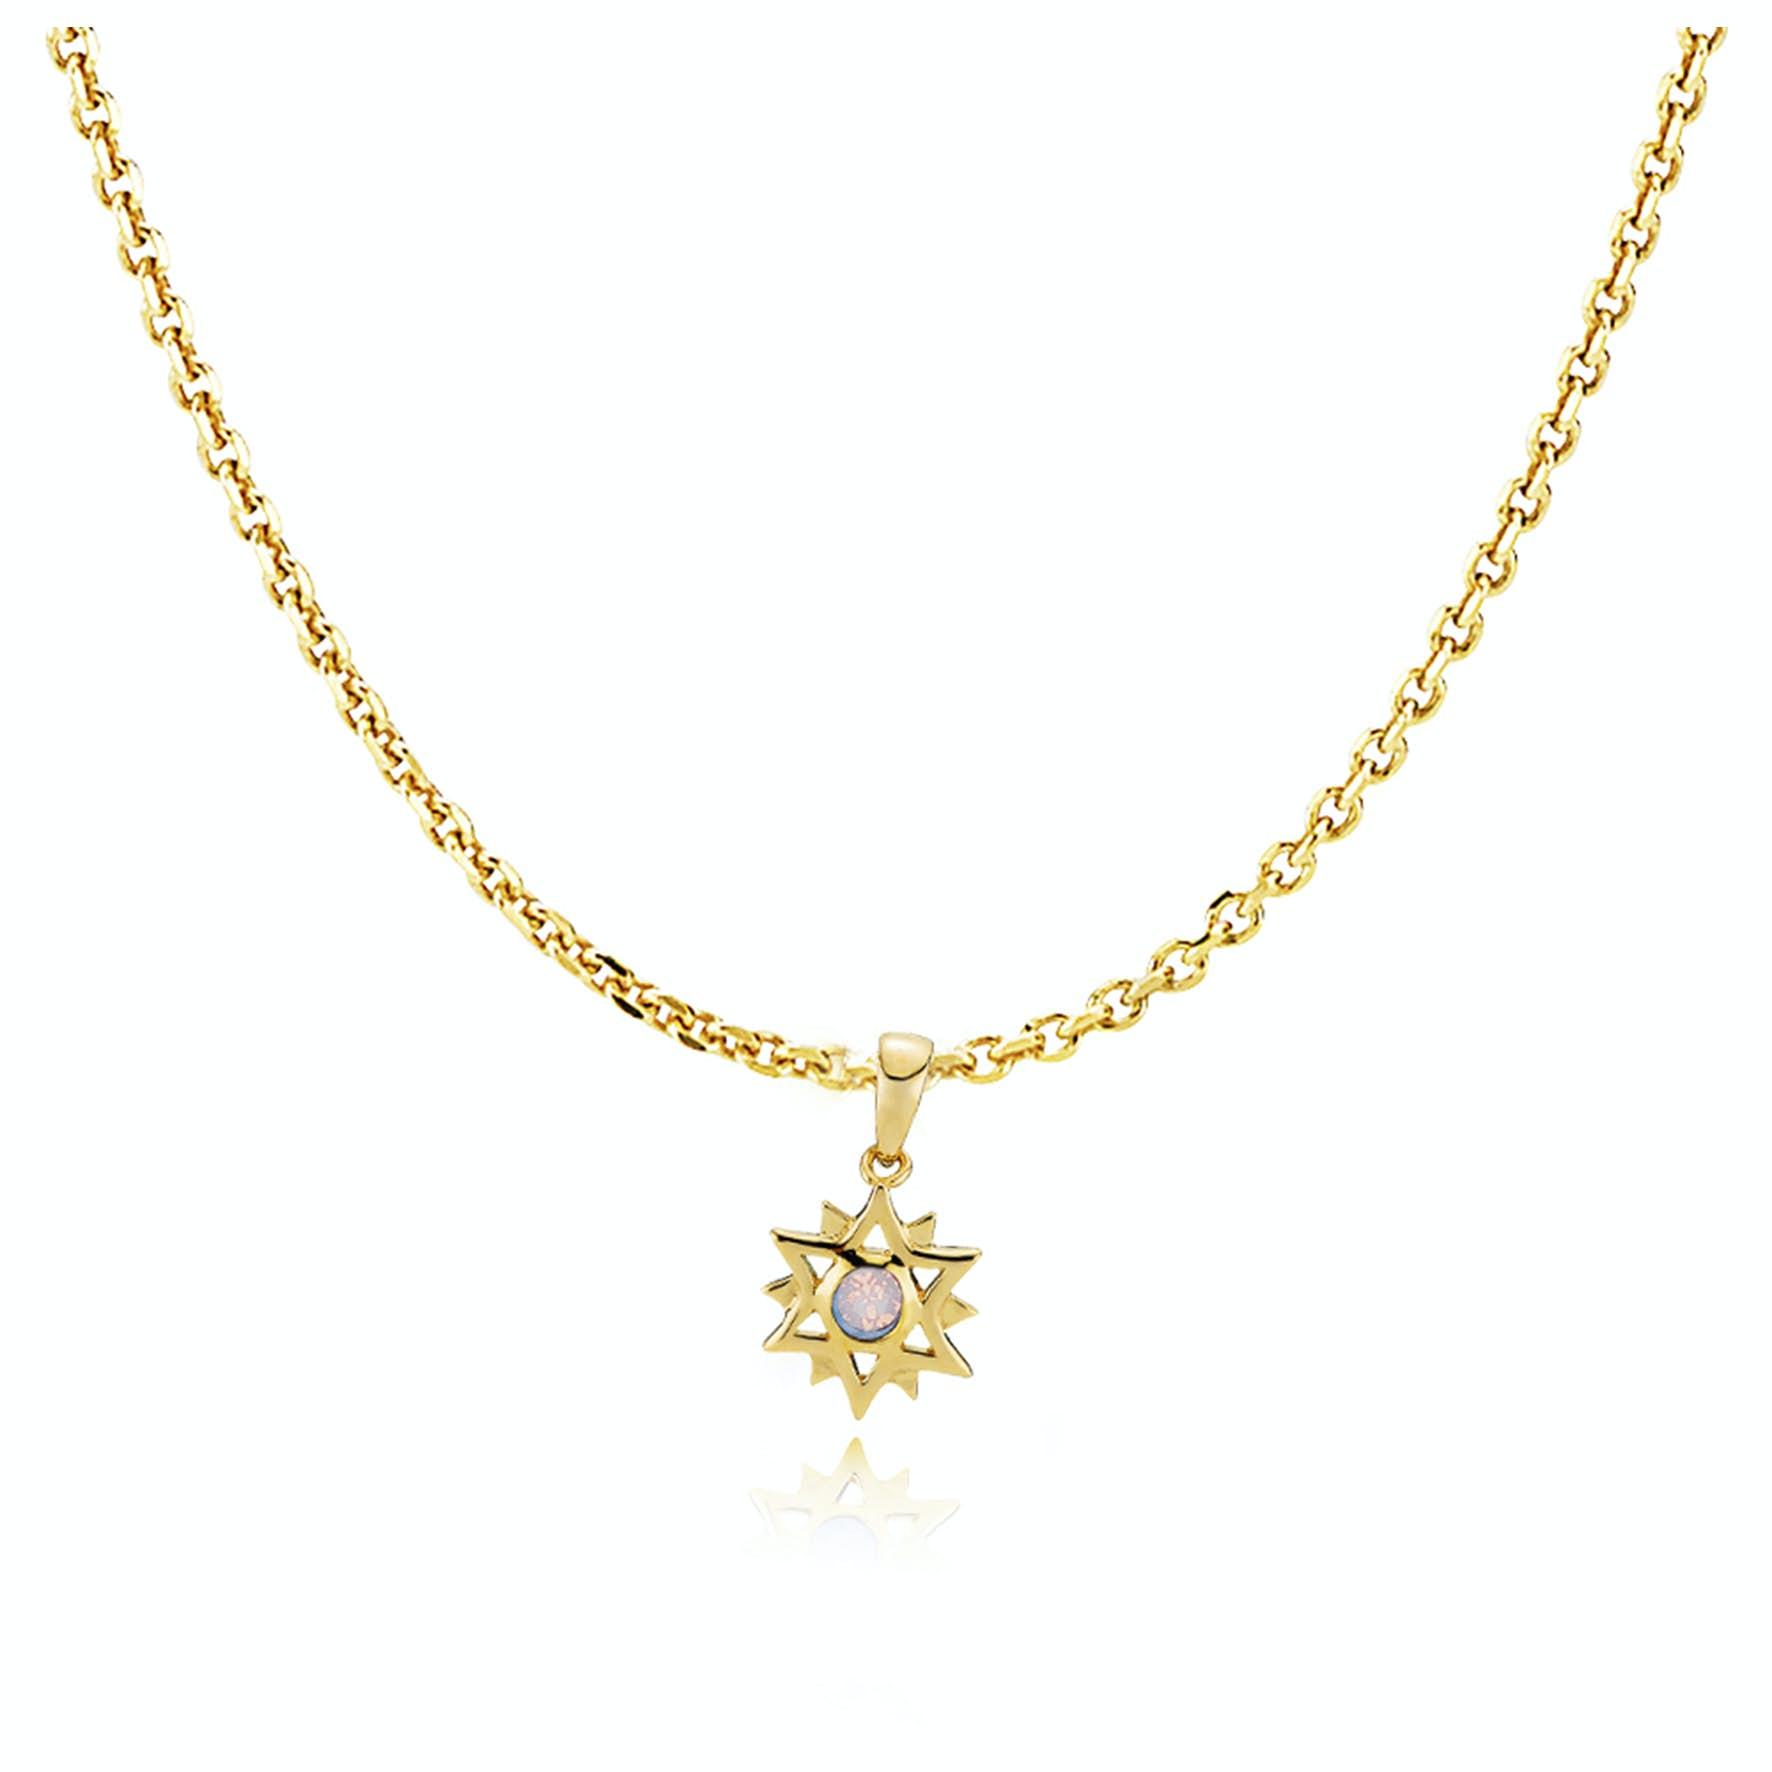 Olivia By Sistie Pendant Necklace Rose Opal fra Sistie i Forgylt-Sølv Sterling 925